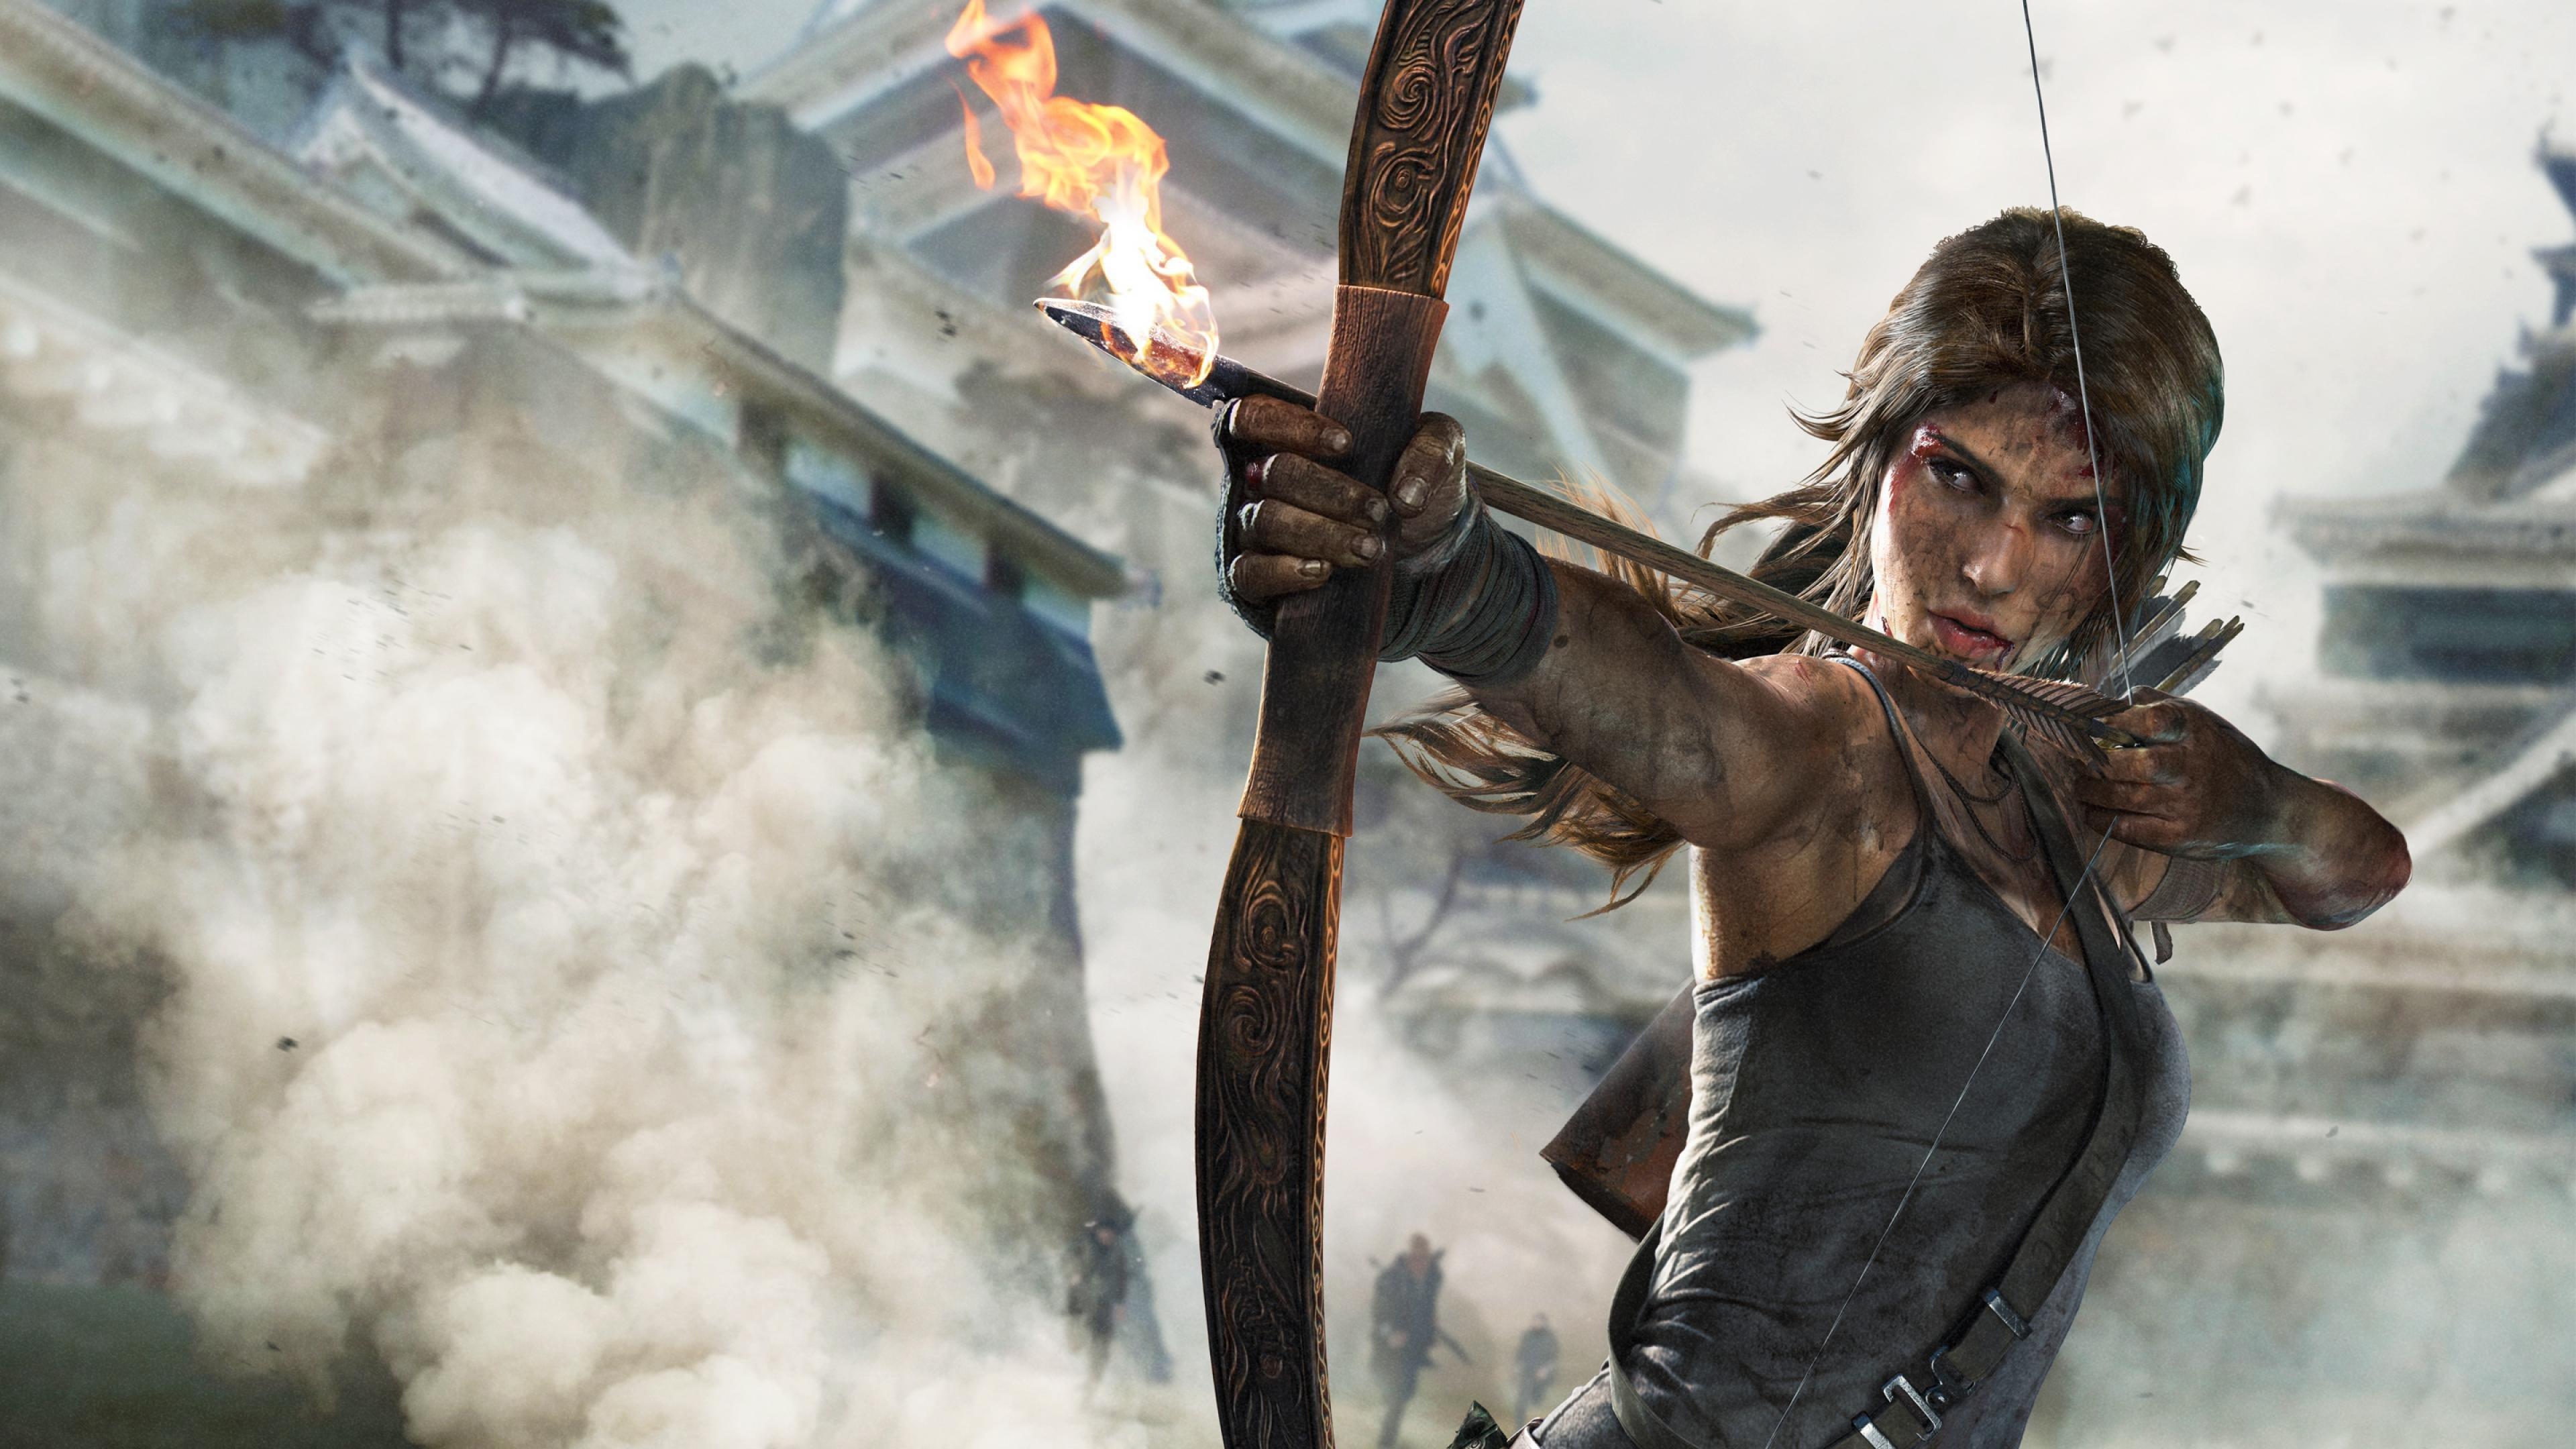 RISE TOMB RAIDER Lara Croft Action Adventure Fantasy Warrior Wallpaper